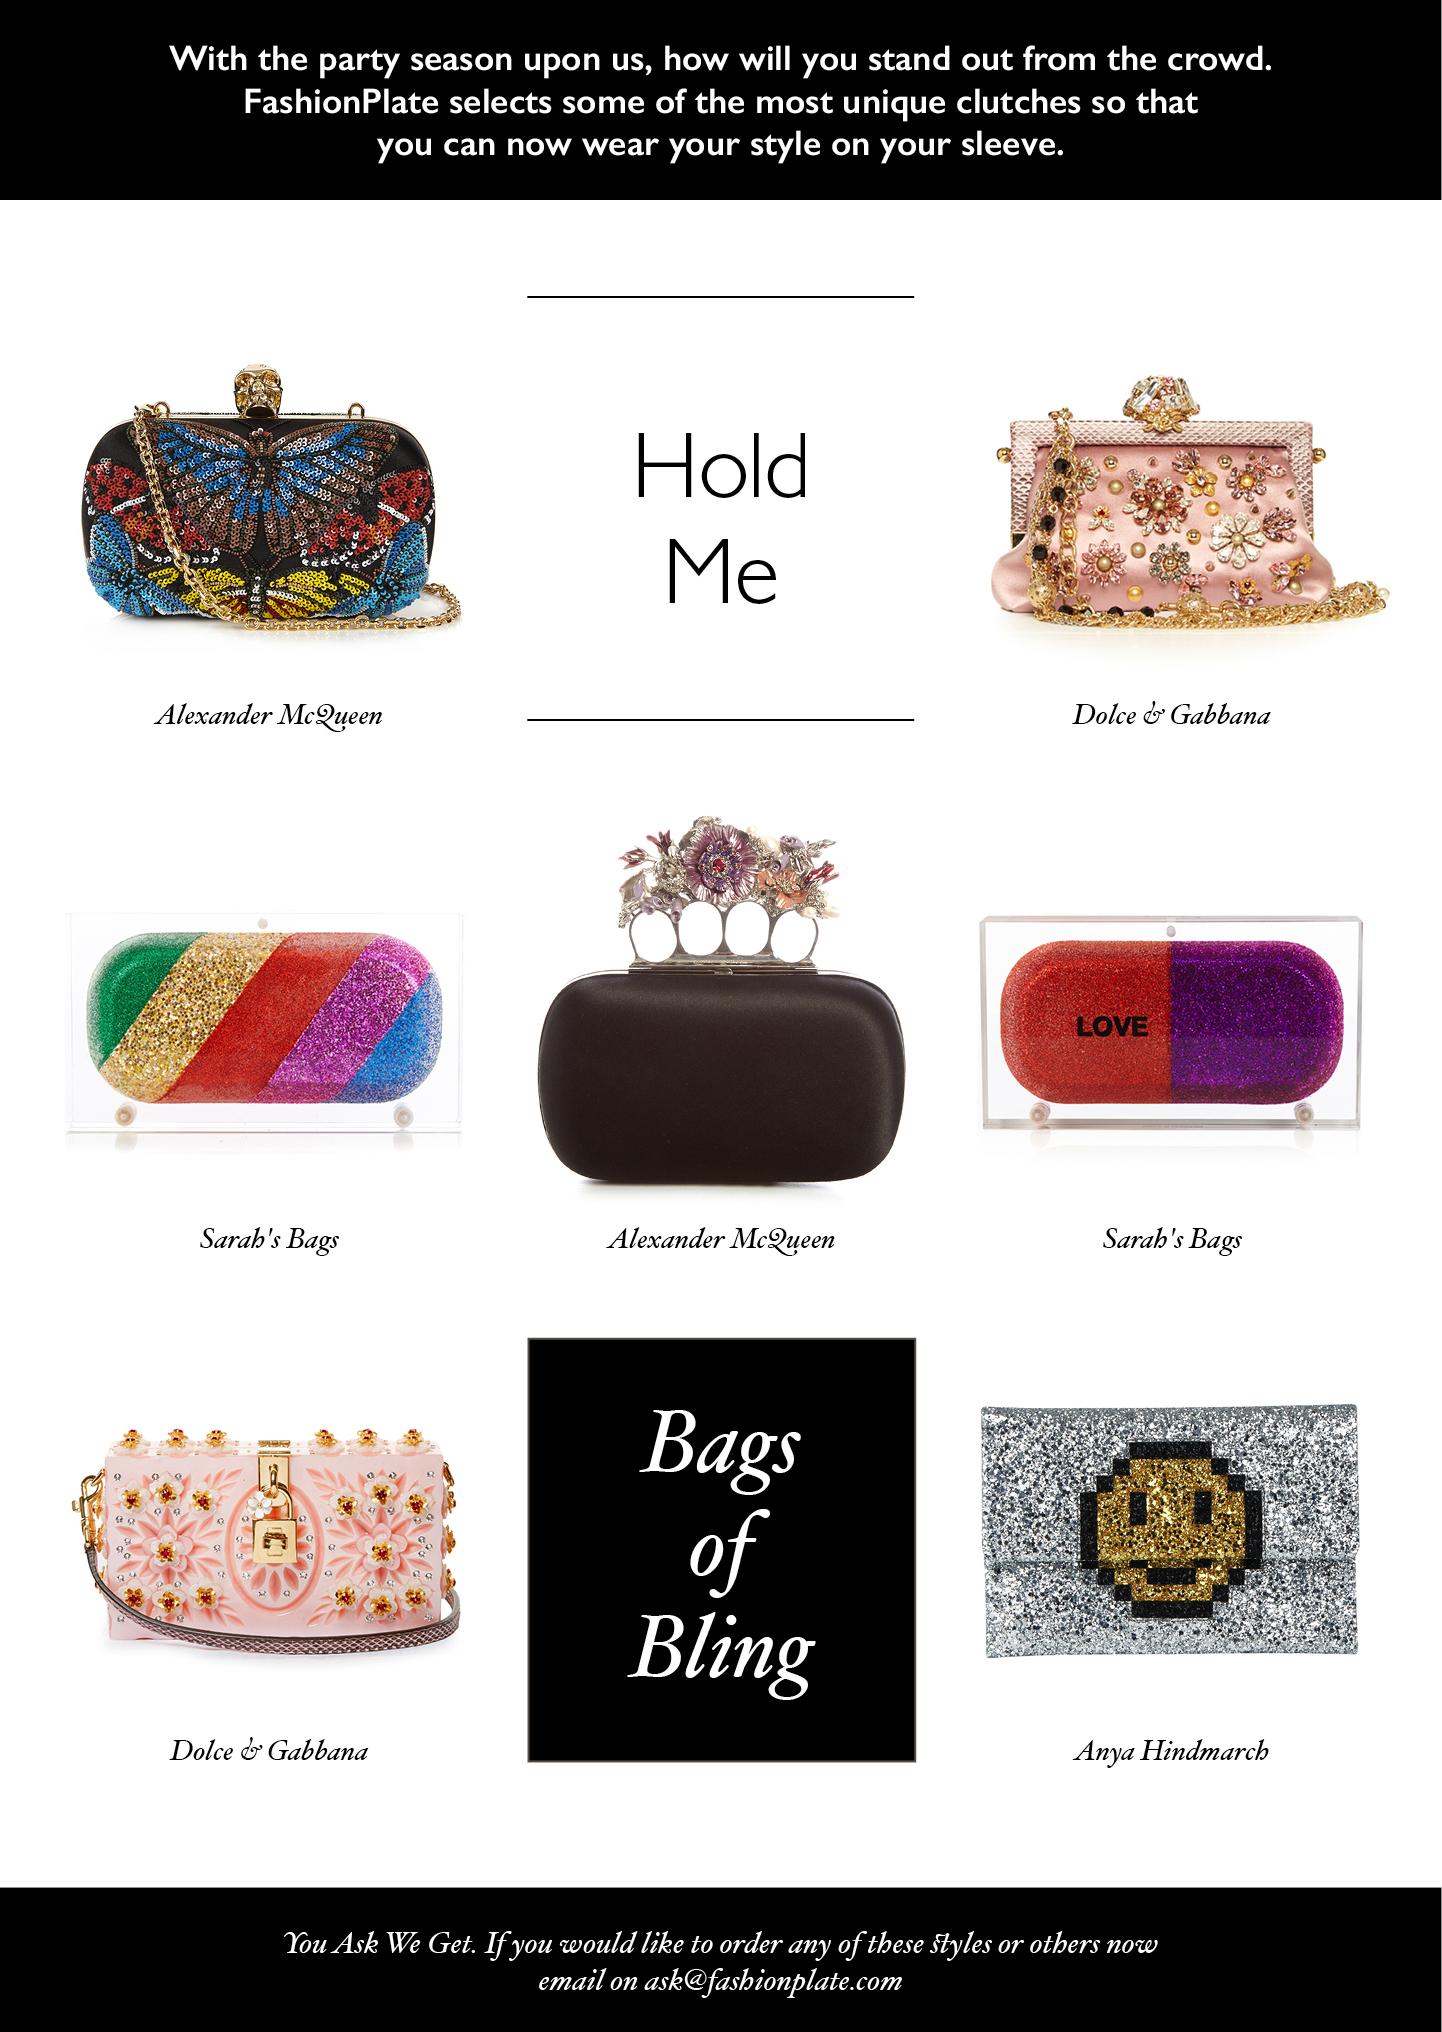 fashionplate_bags